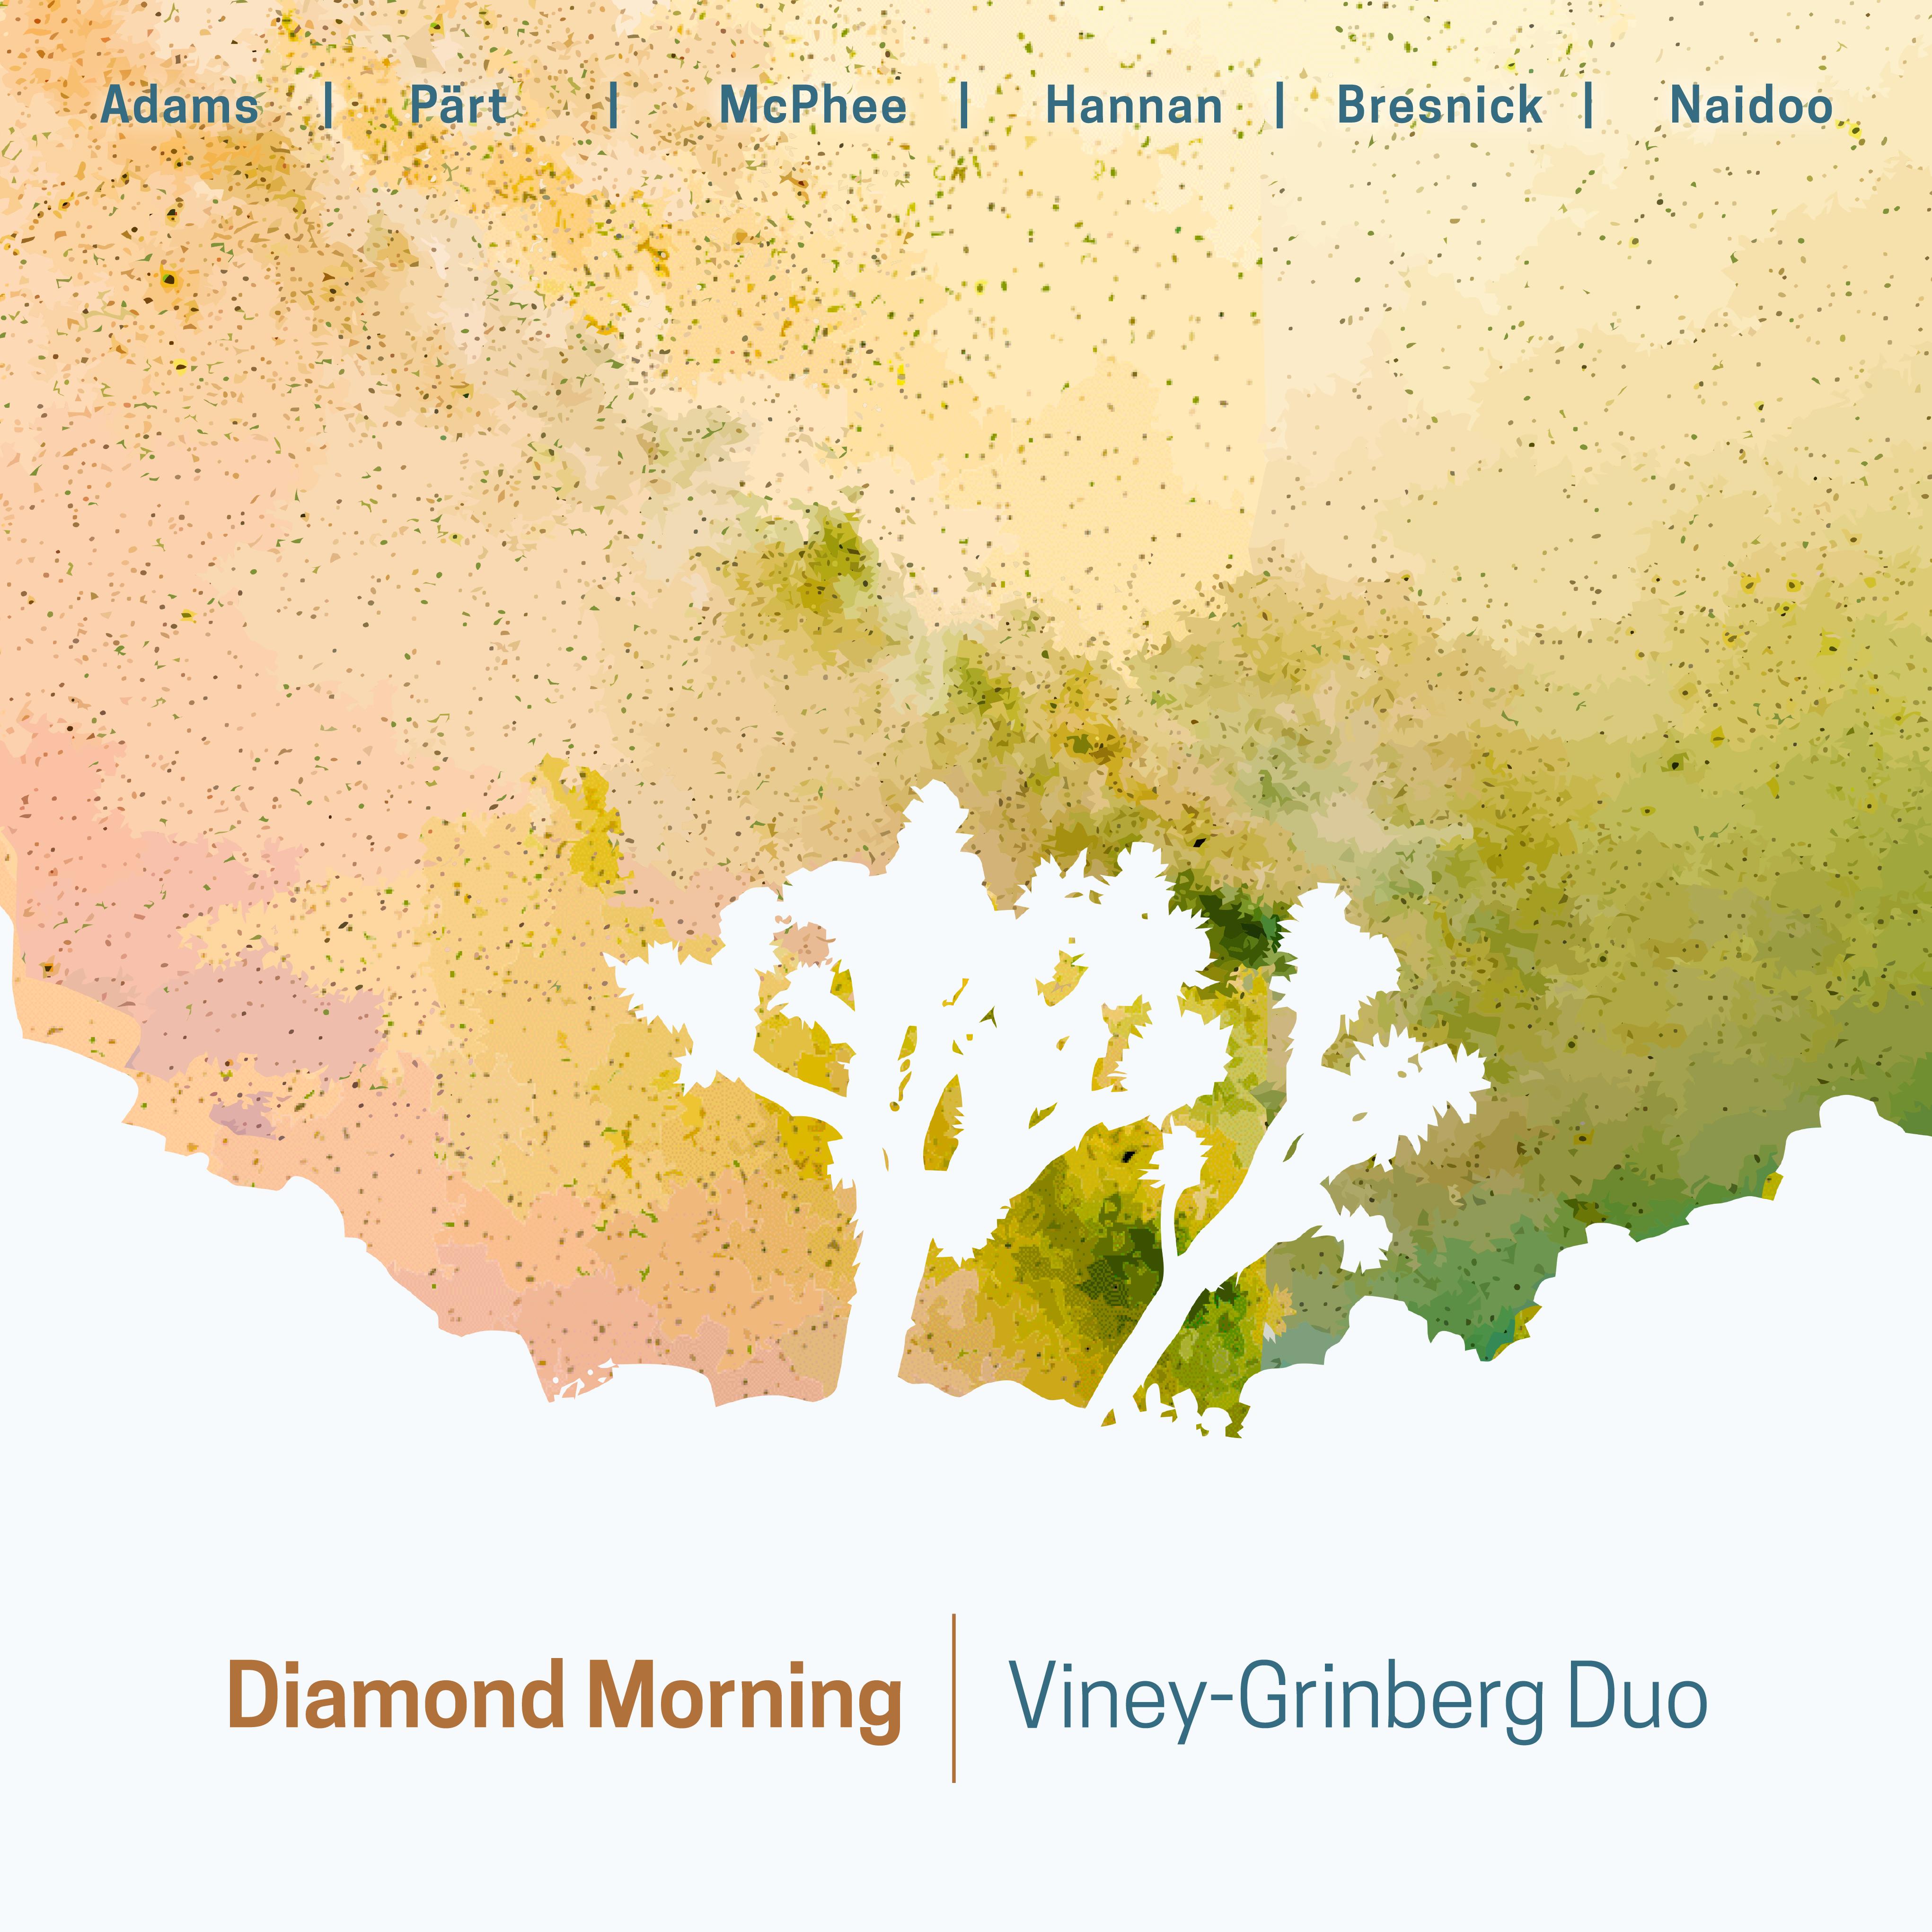 Design a creative and artistic album cover for innovative contemporary classical piano music.